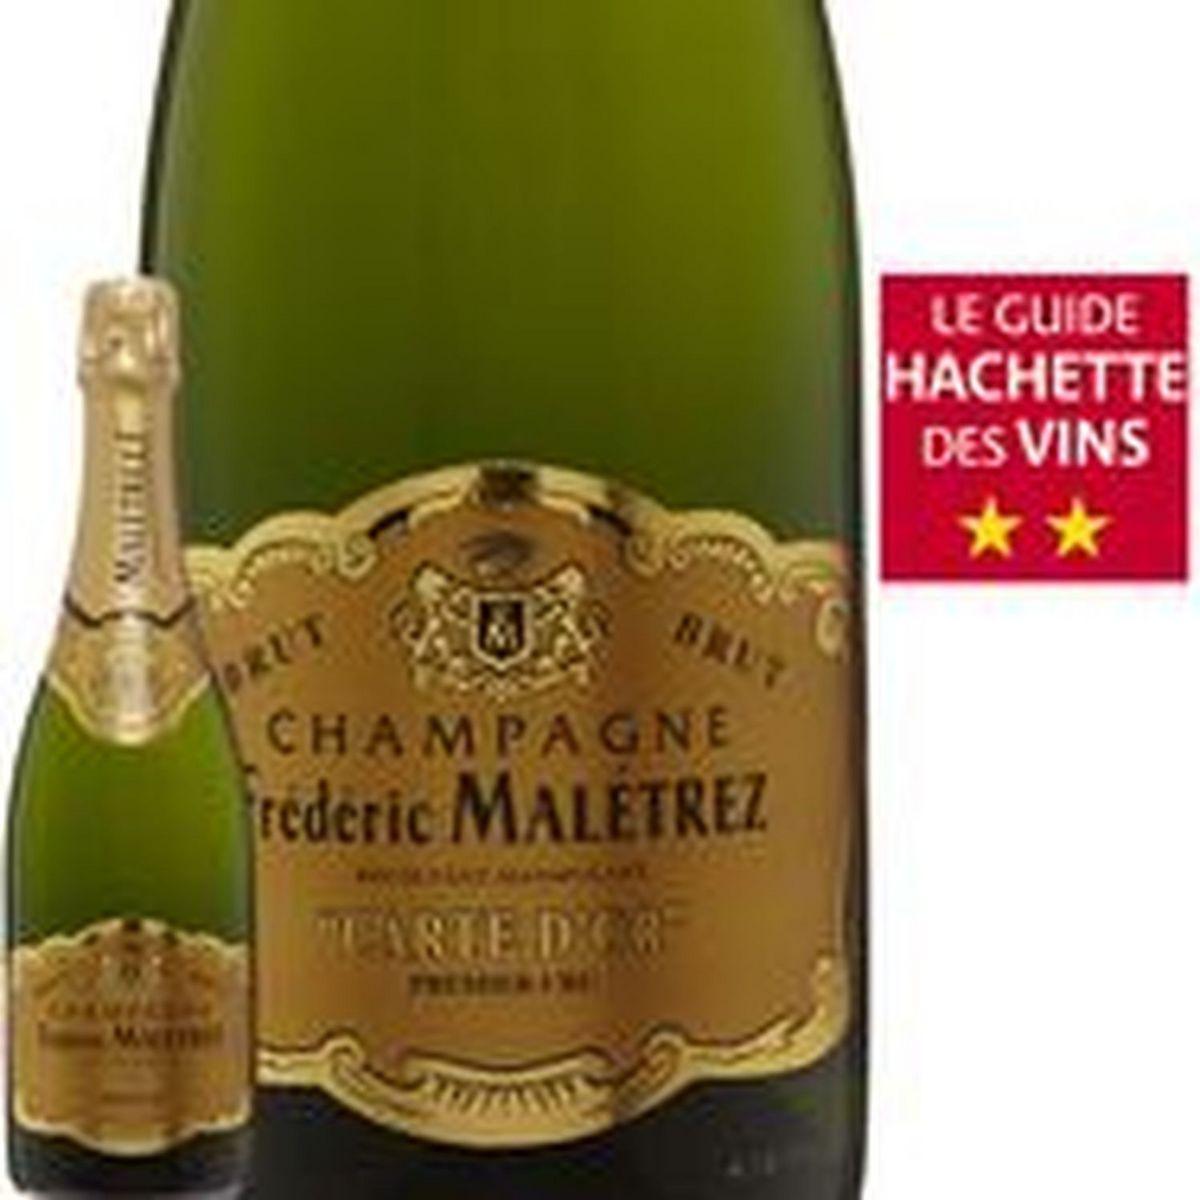 AOP Champagne Brut Frederic Maletrez 1er Cru